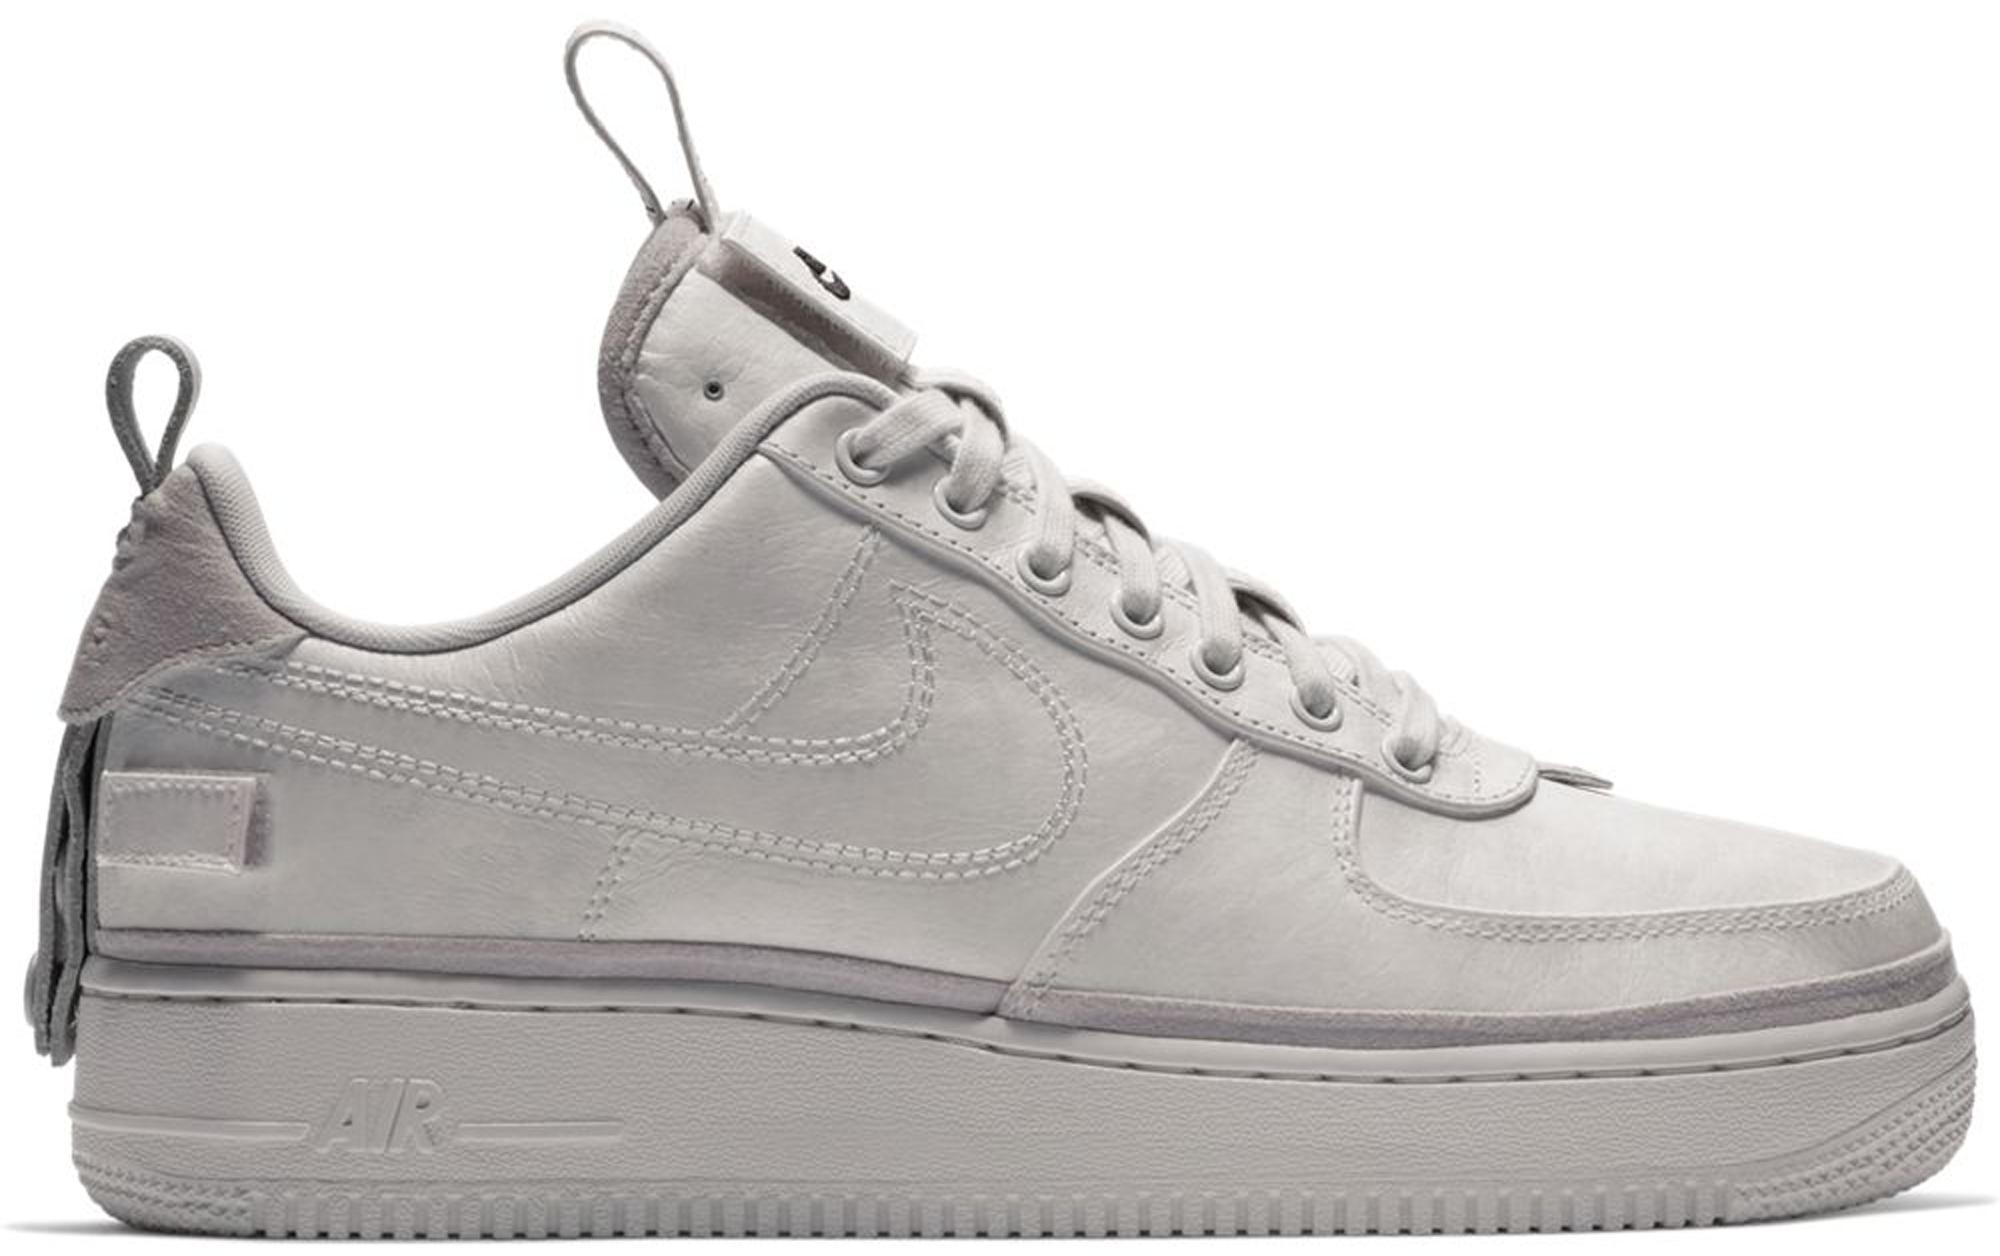 Santuario piloto Avanzado  Nike Air Force 1 Low 90/10 All-Star (2018) in 2020 | Nike air force, Nike,  Nike force 1